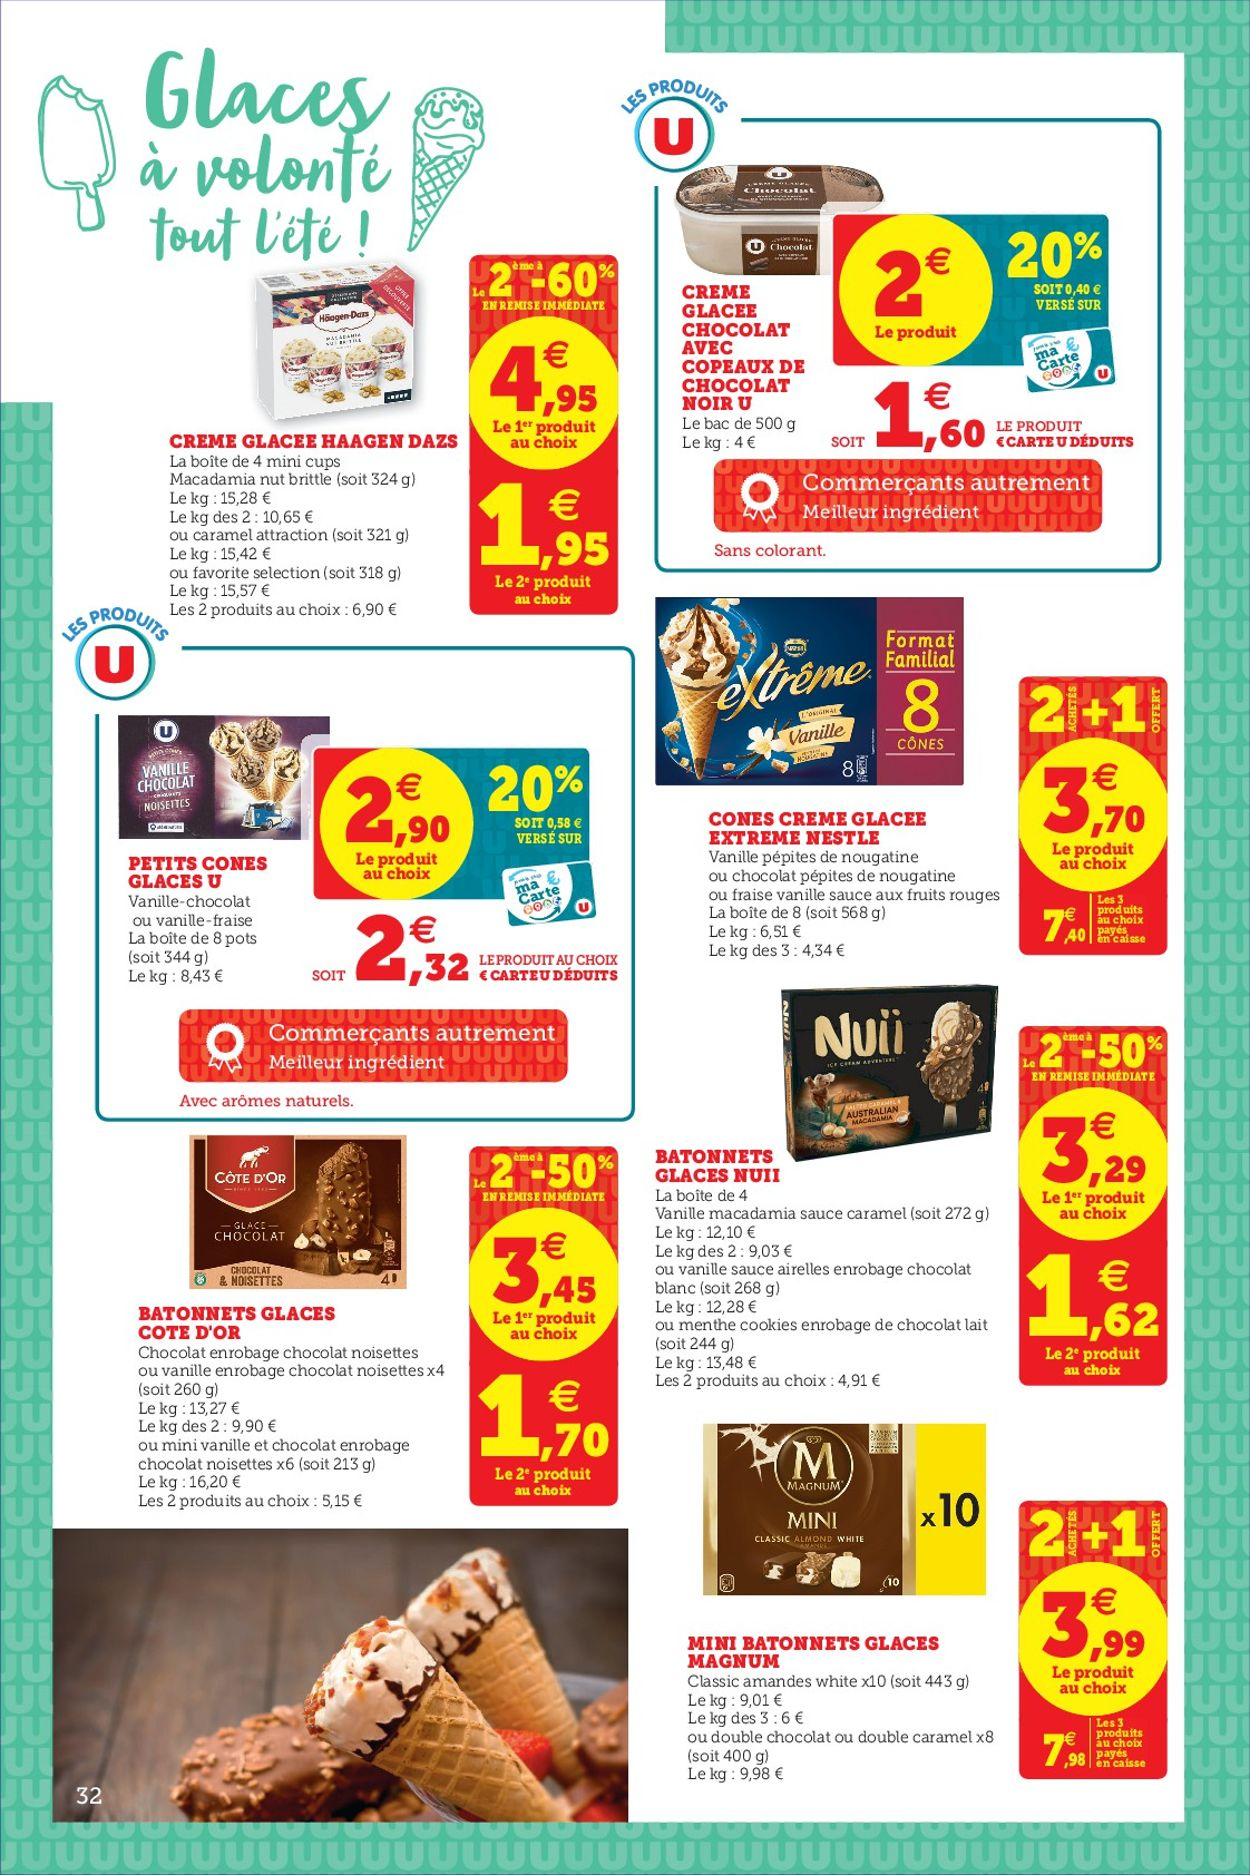 Magasins U Catalogue - 07.07-18.07.2020 (Page 32)